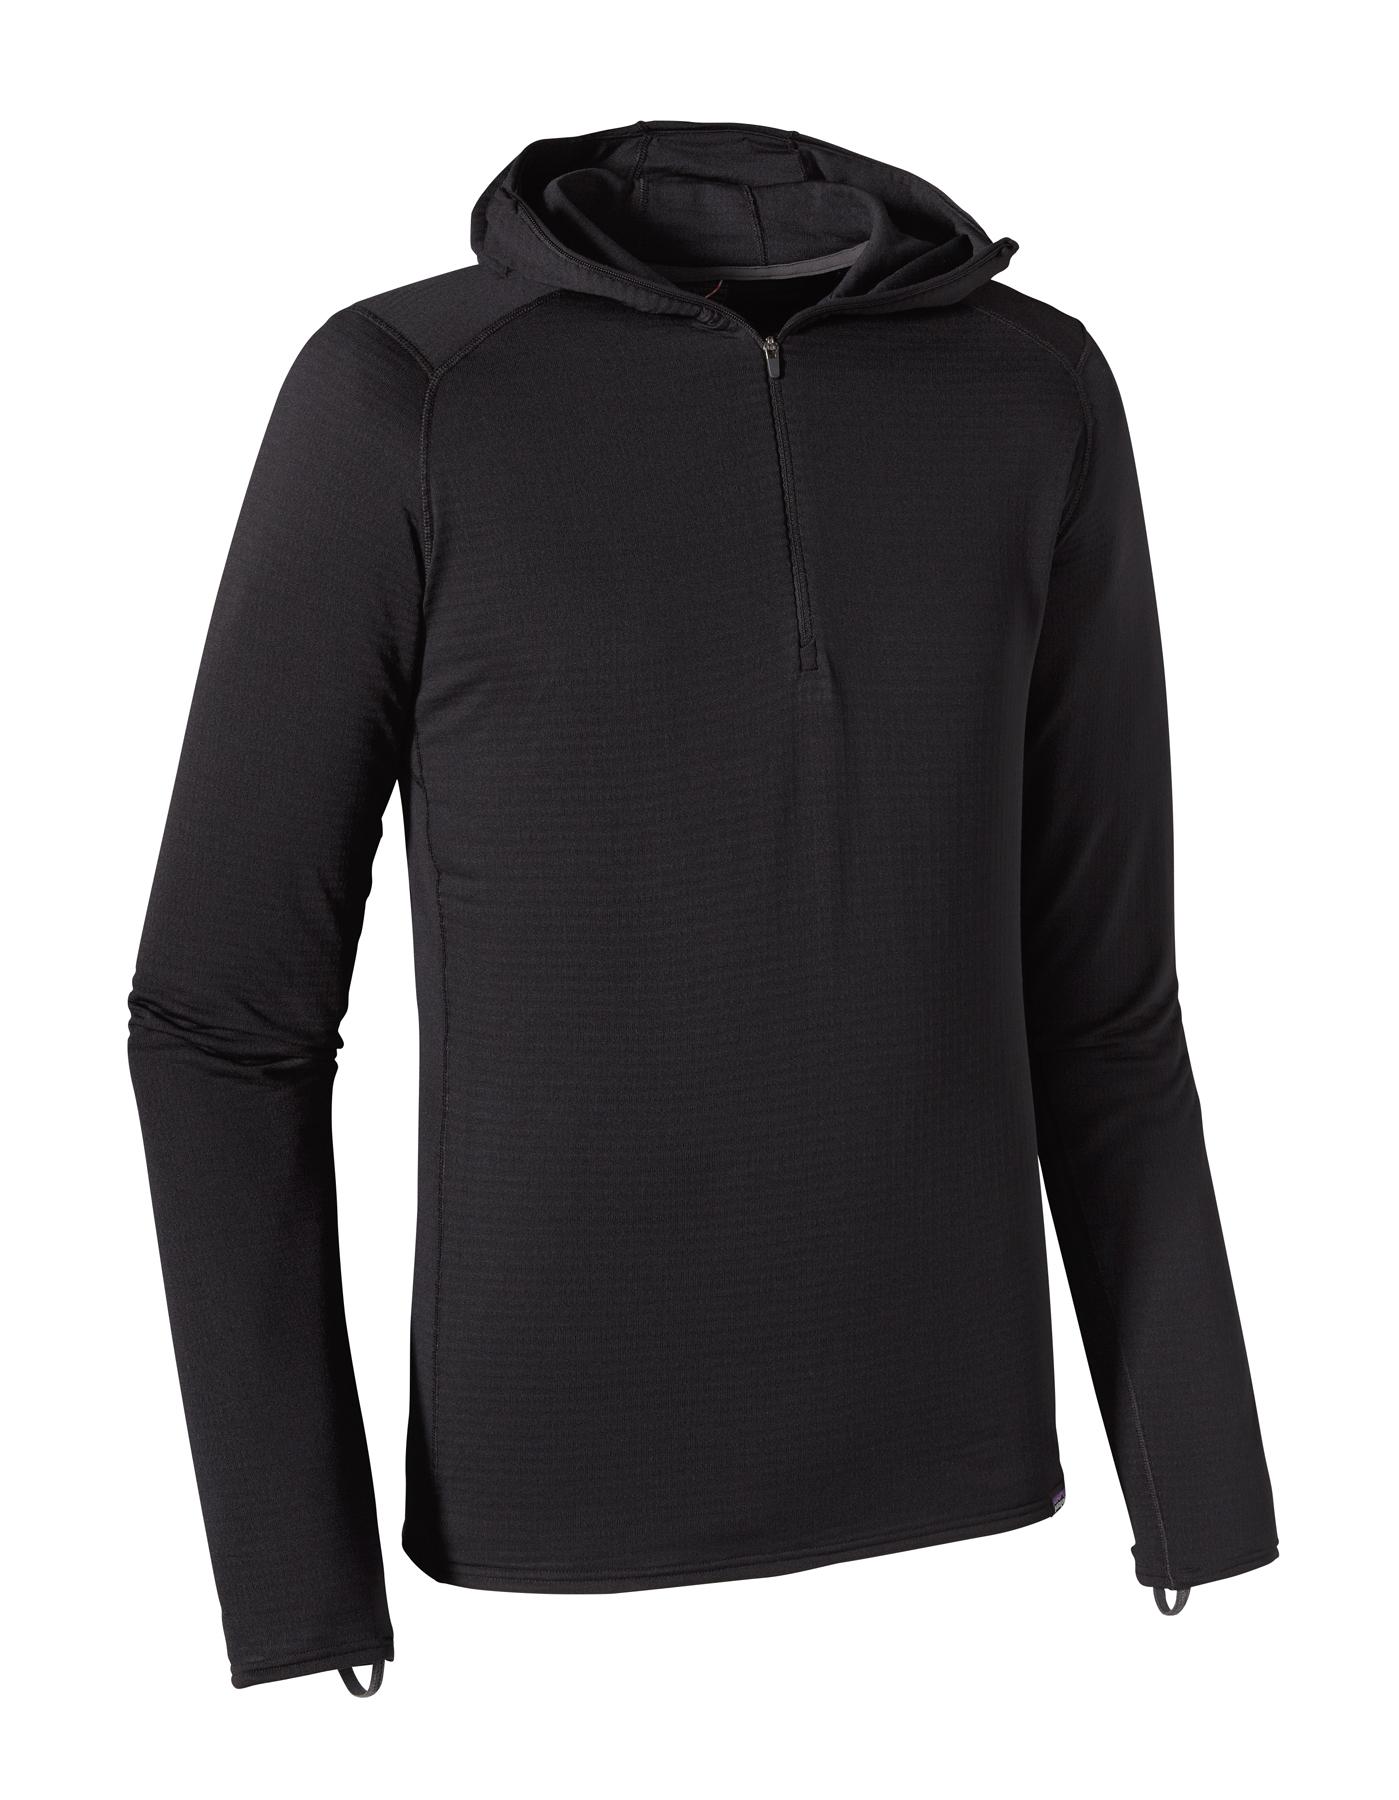 Patagonia - Capilene Thermal Weight Zip Neck Hoody - Camiseta técnica - Hombre